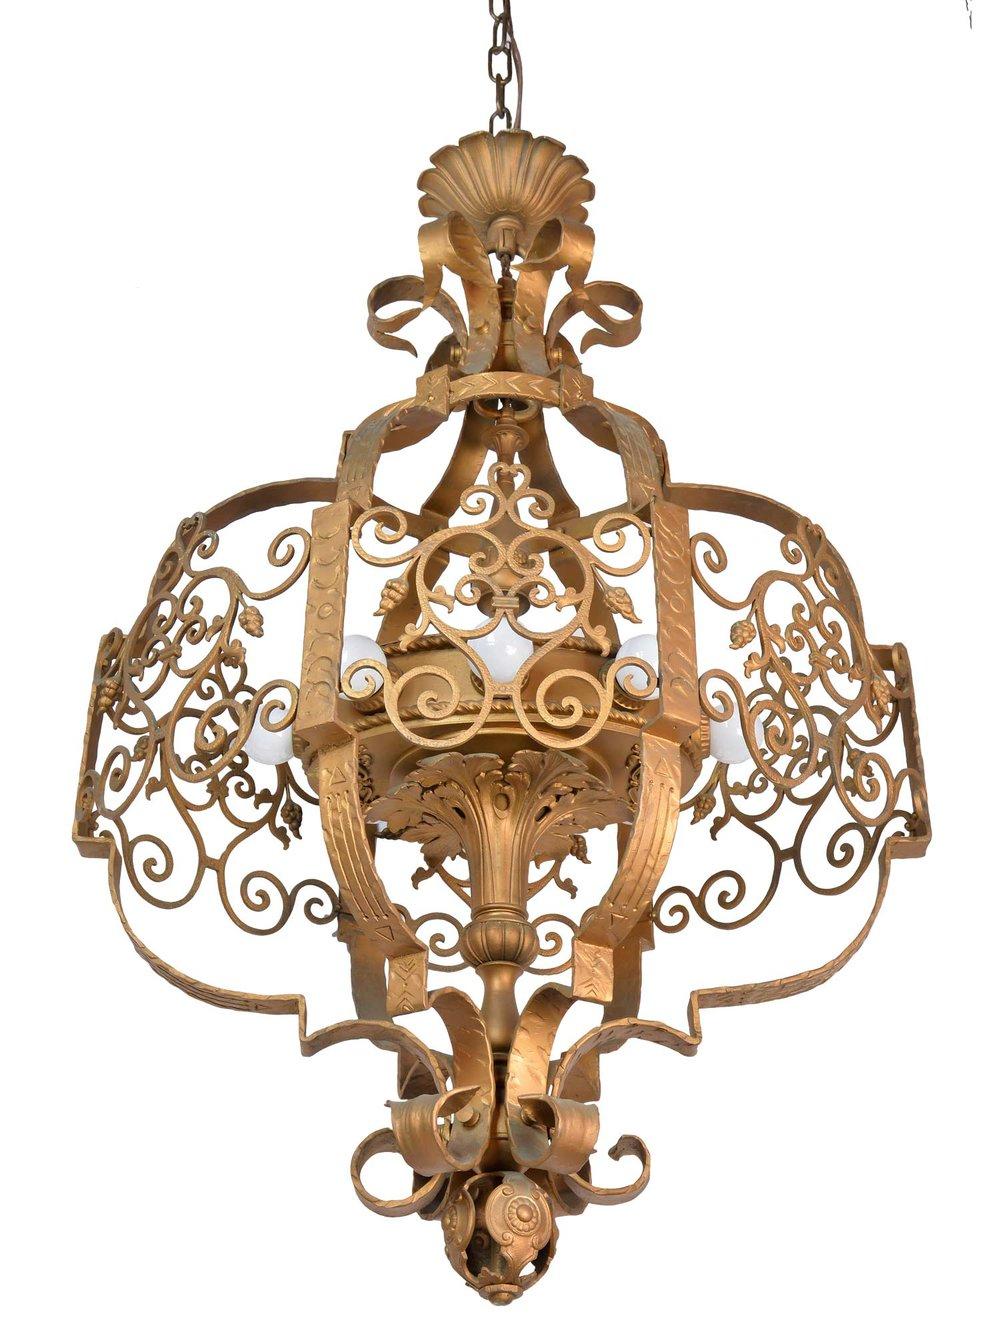 45971-ornate-iron-theatre-light-angle.jpg